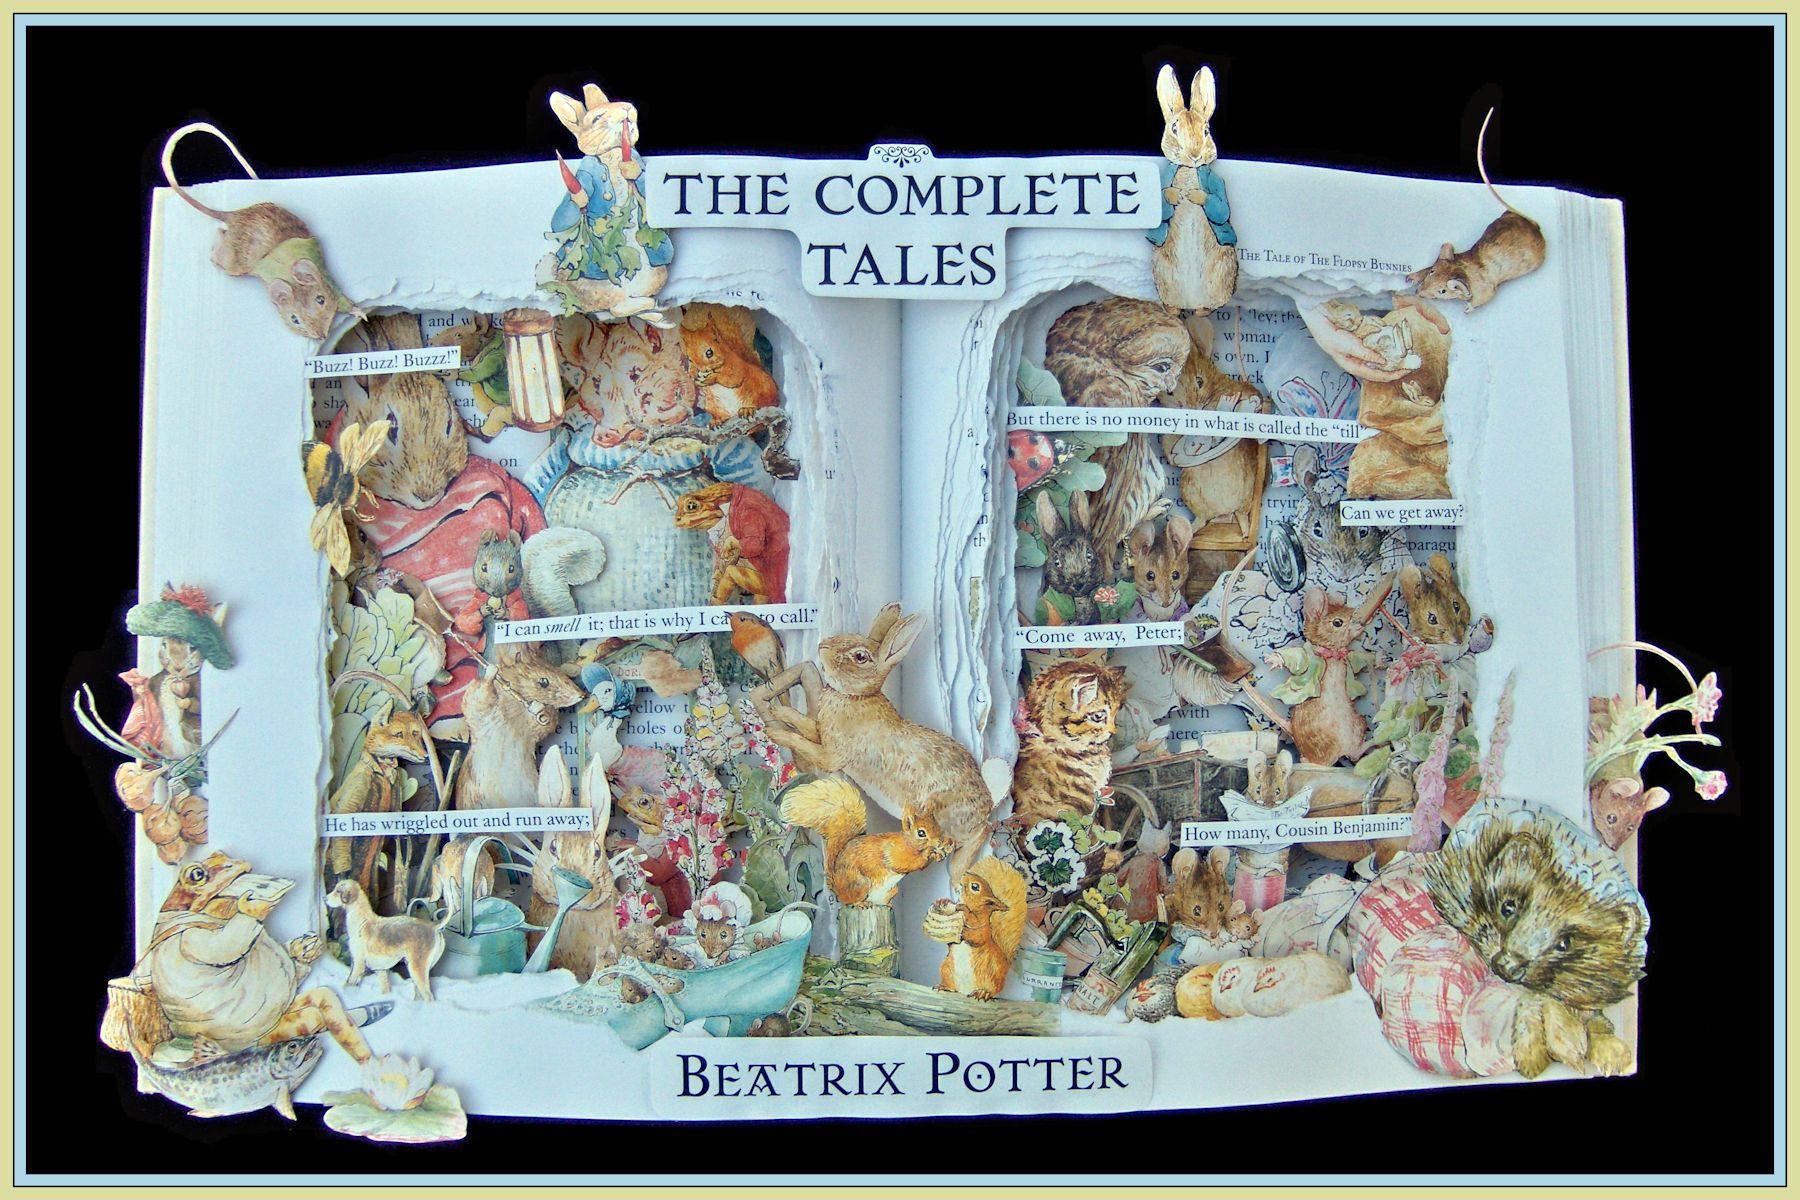 BeatrixPotter1.jpg